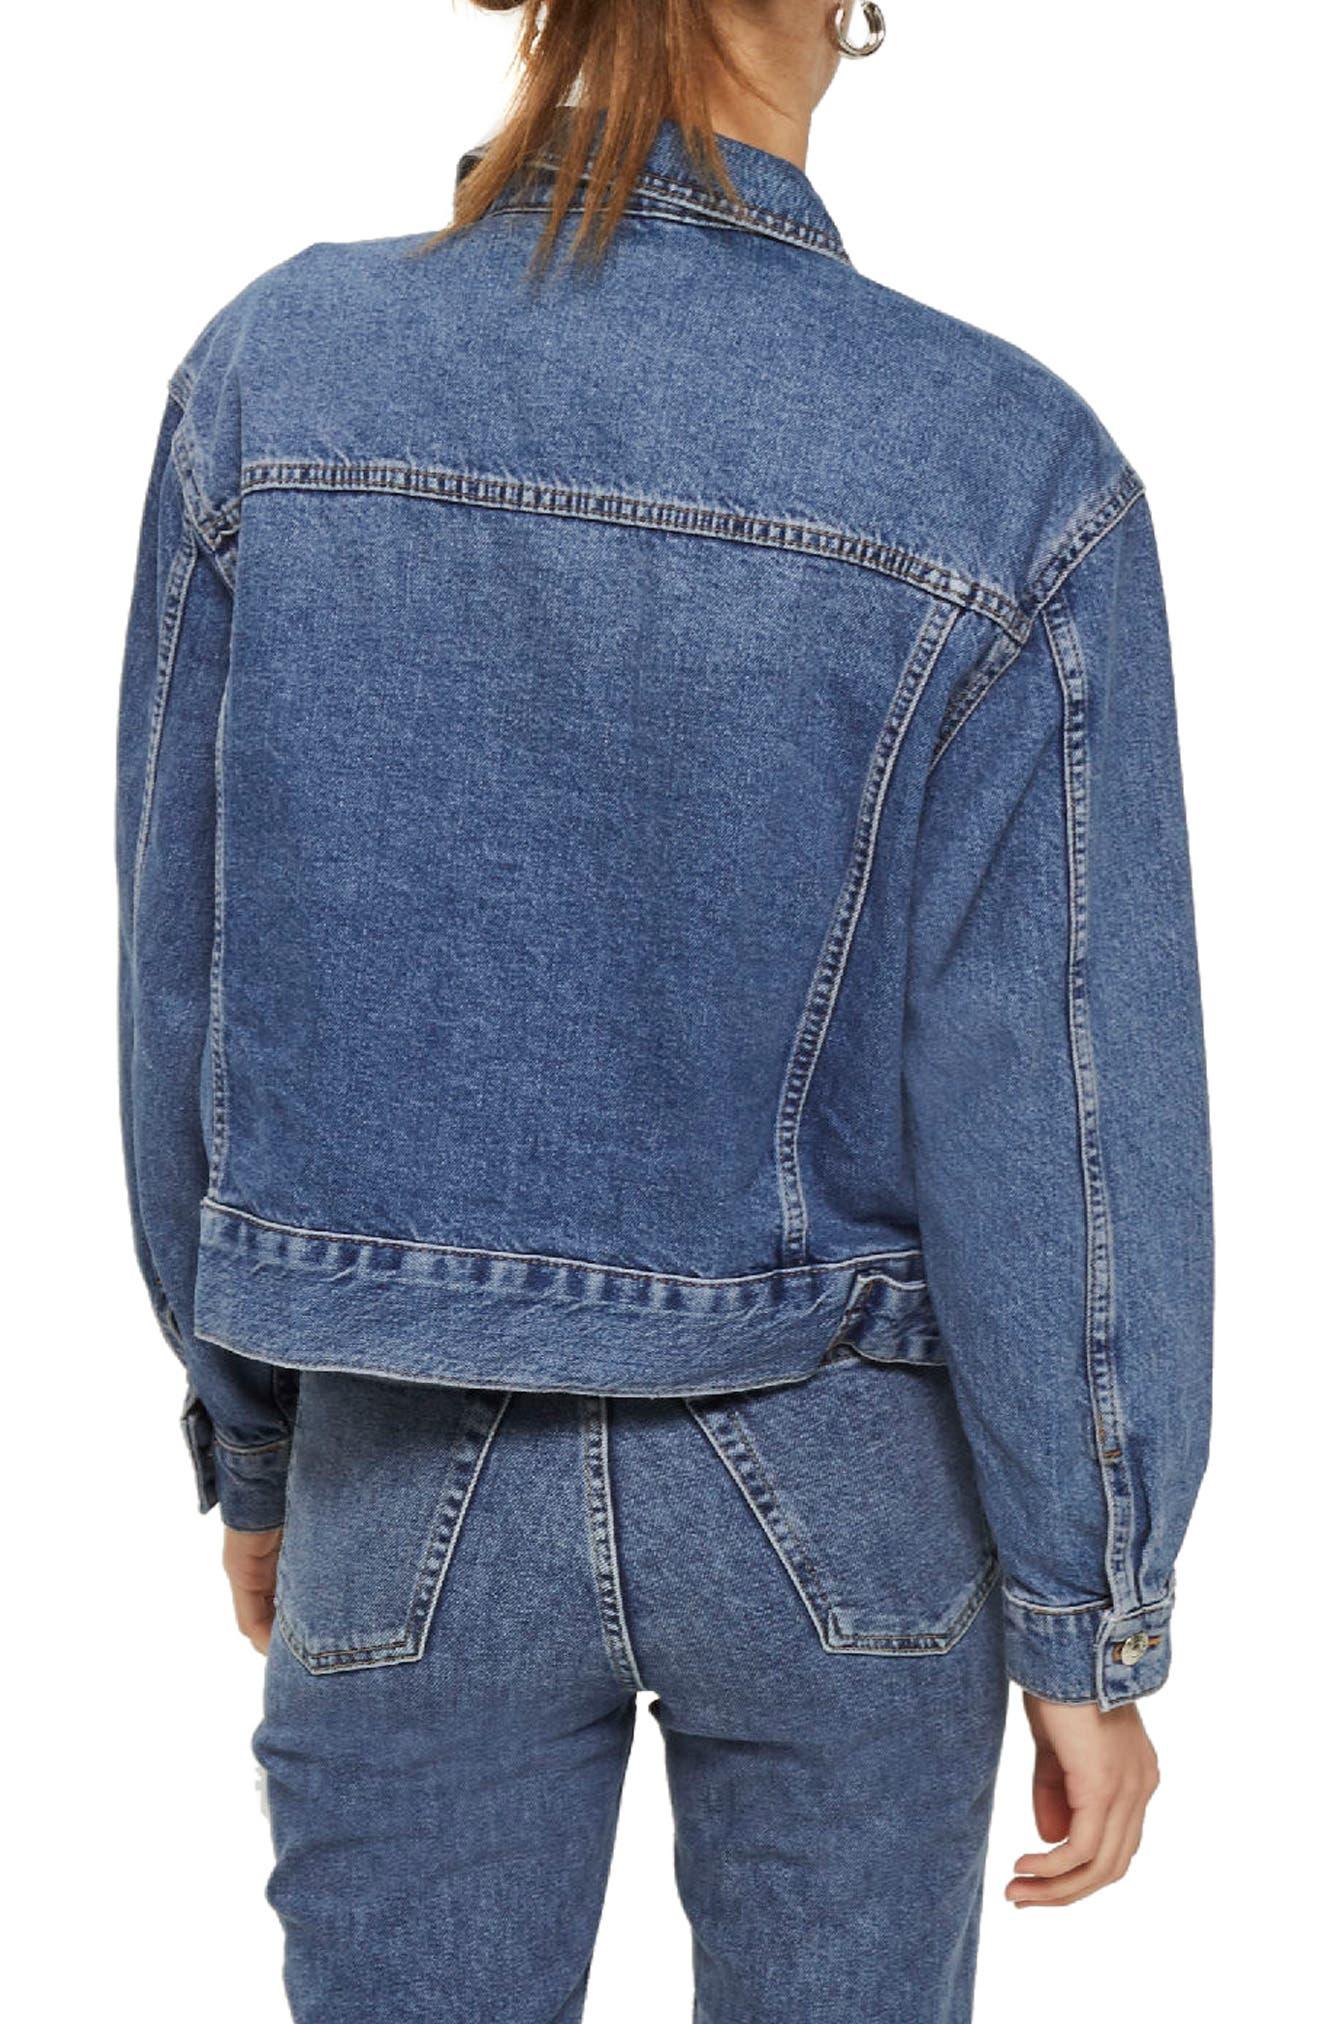 TOPSHOP, Boxy Crop Denim Jacket, Alternate thumbnail 2, color, MID DENIM